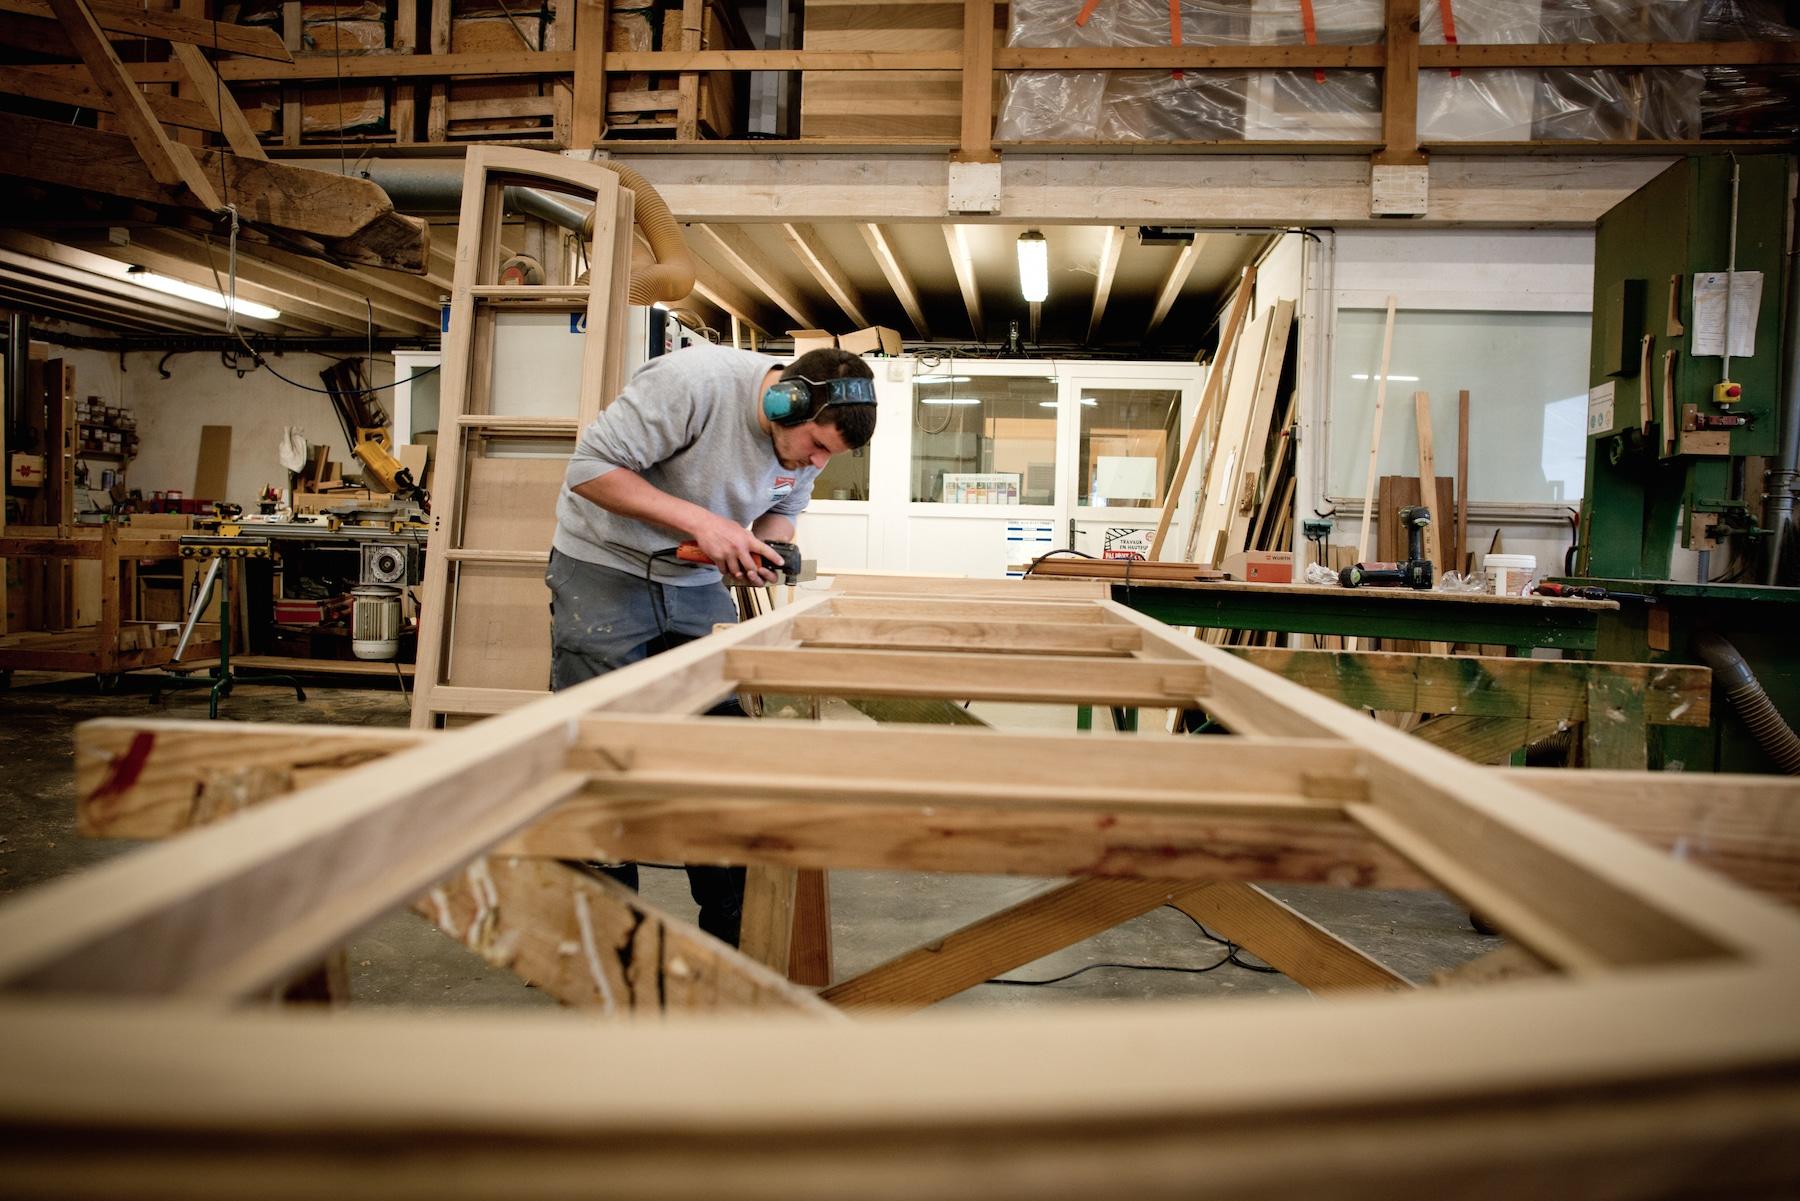 fabrication-de-menuiserie-bayonne-anglet-biarritz-menuisier-darrieumerlou